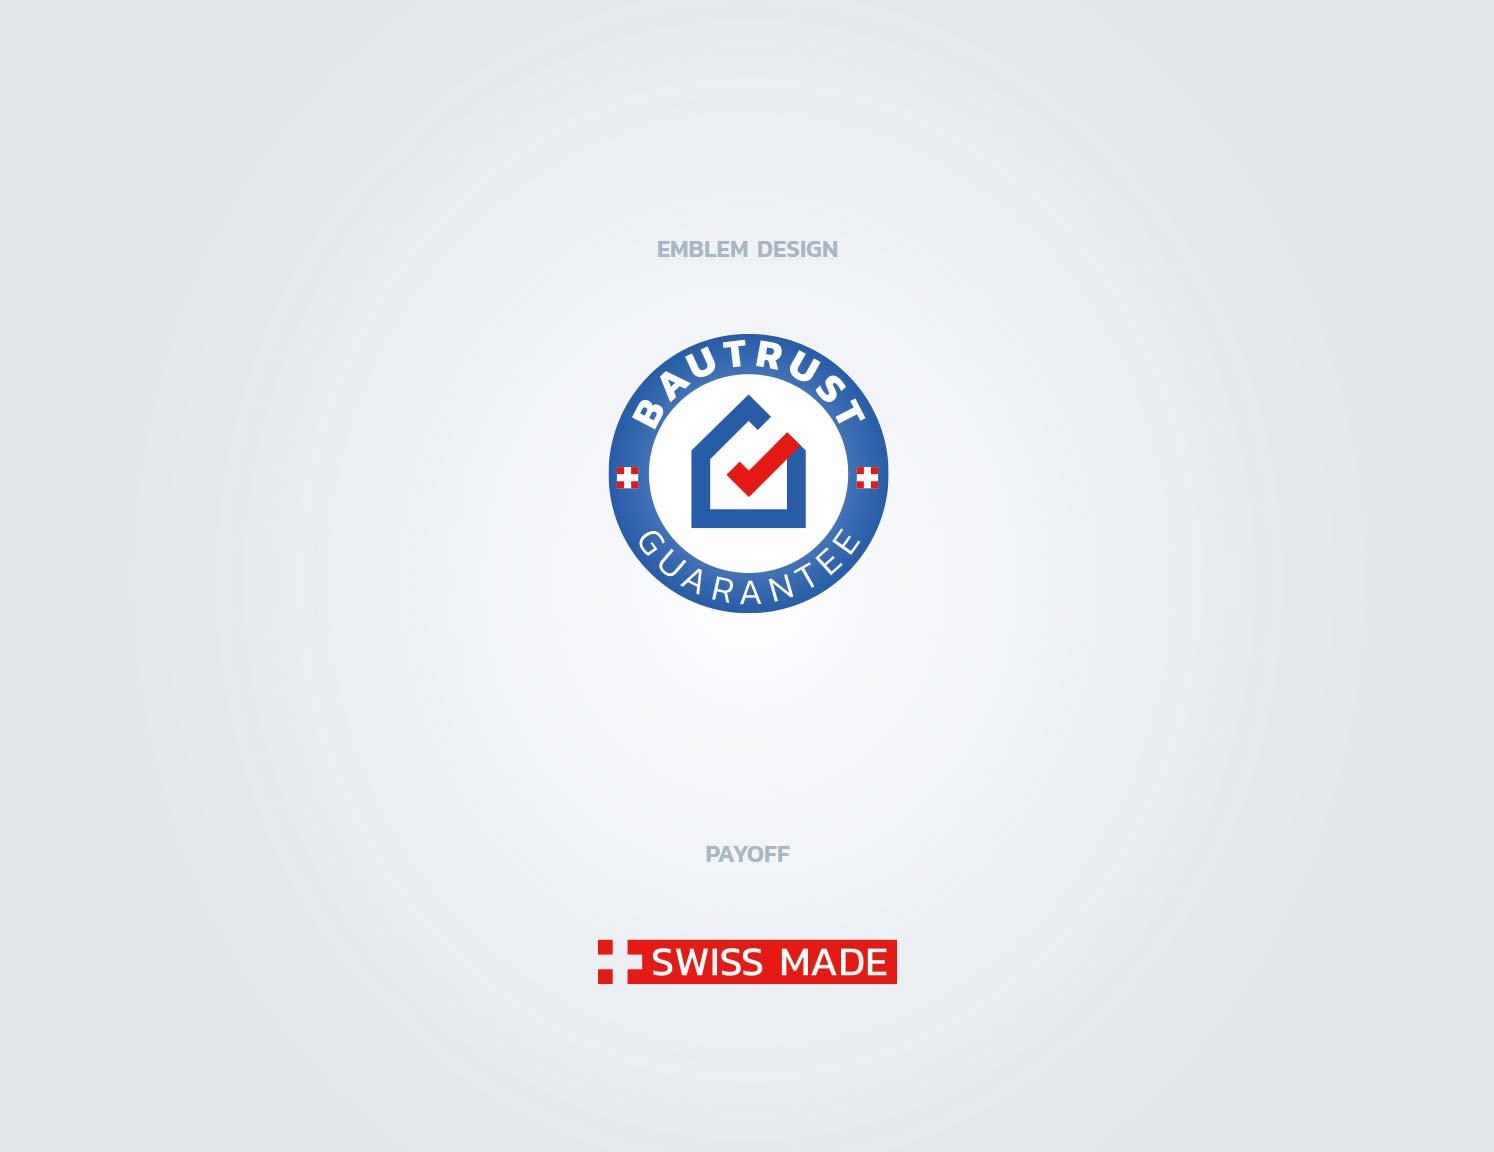 emblem logo brand identity design